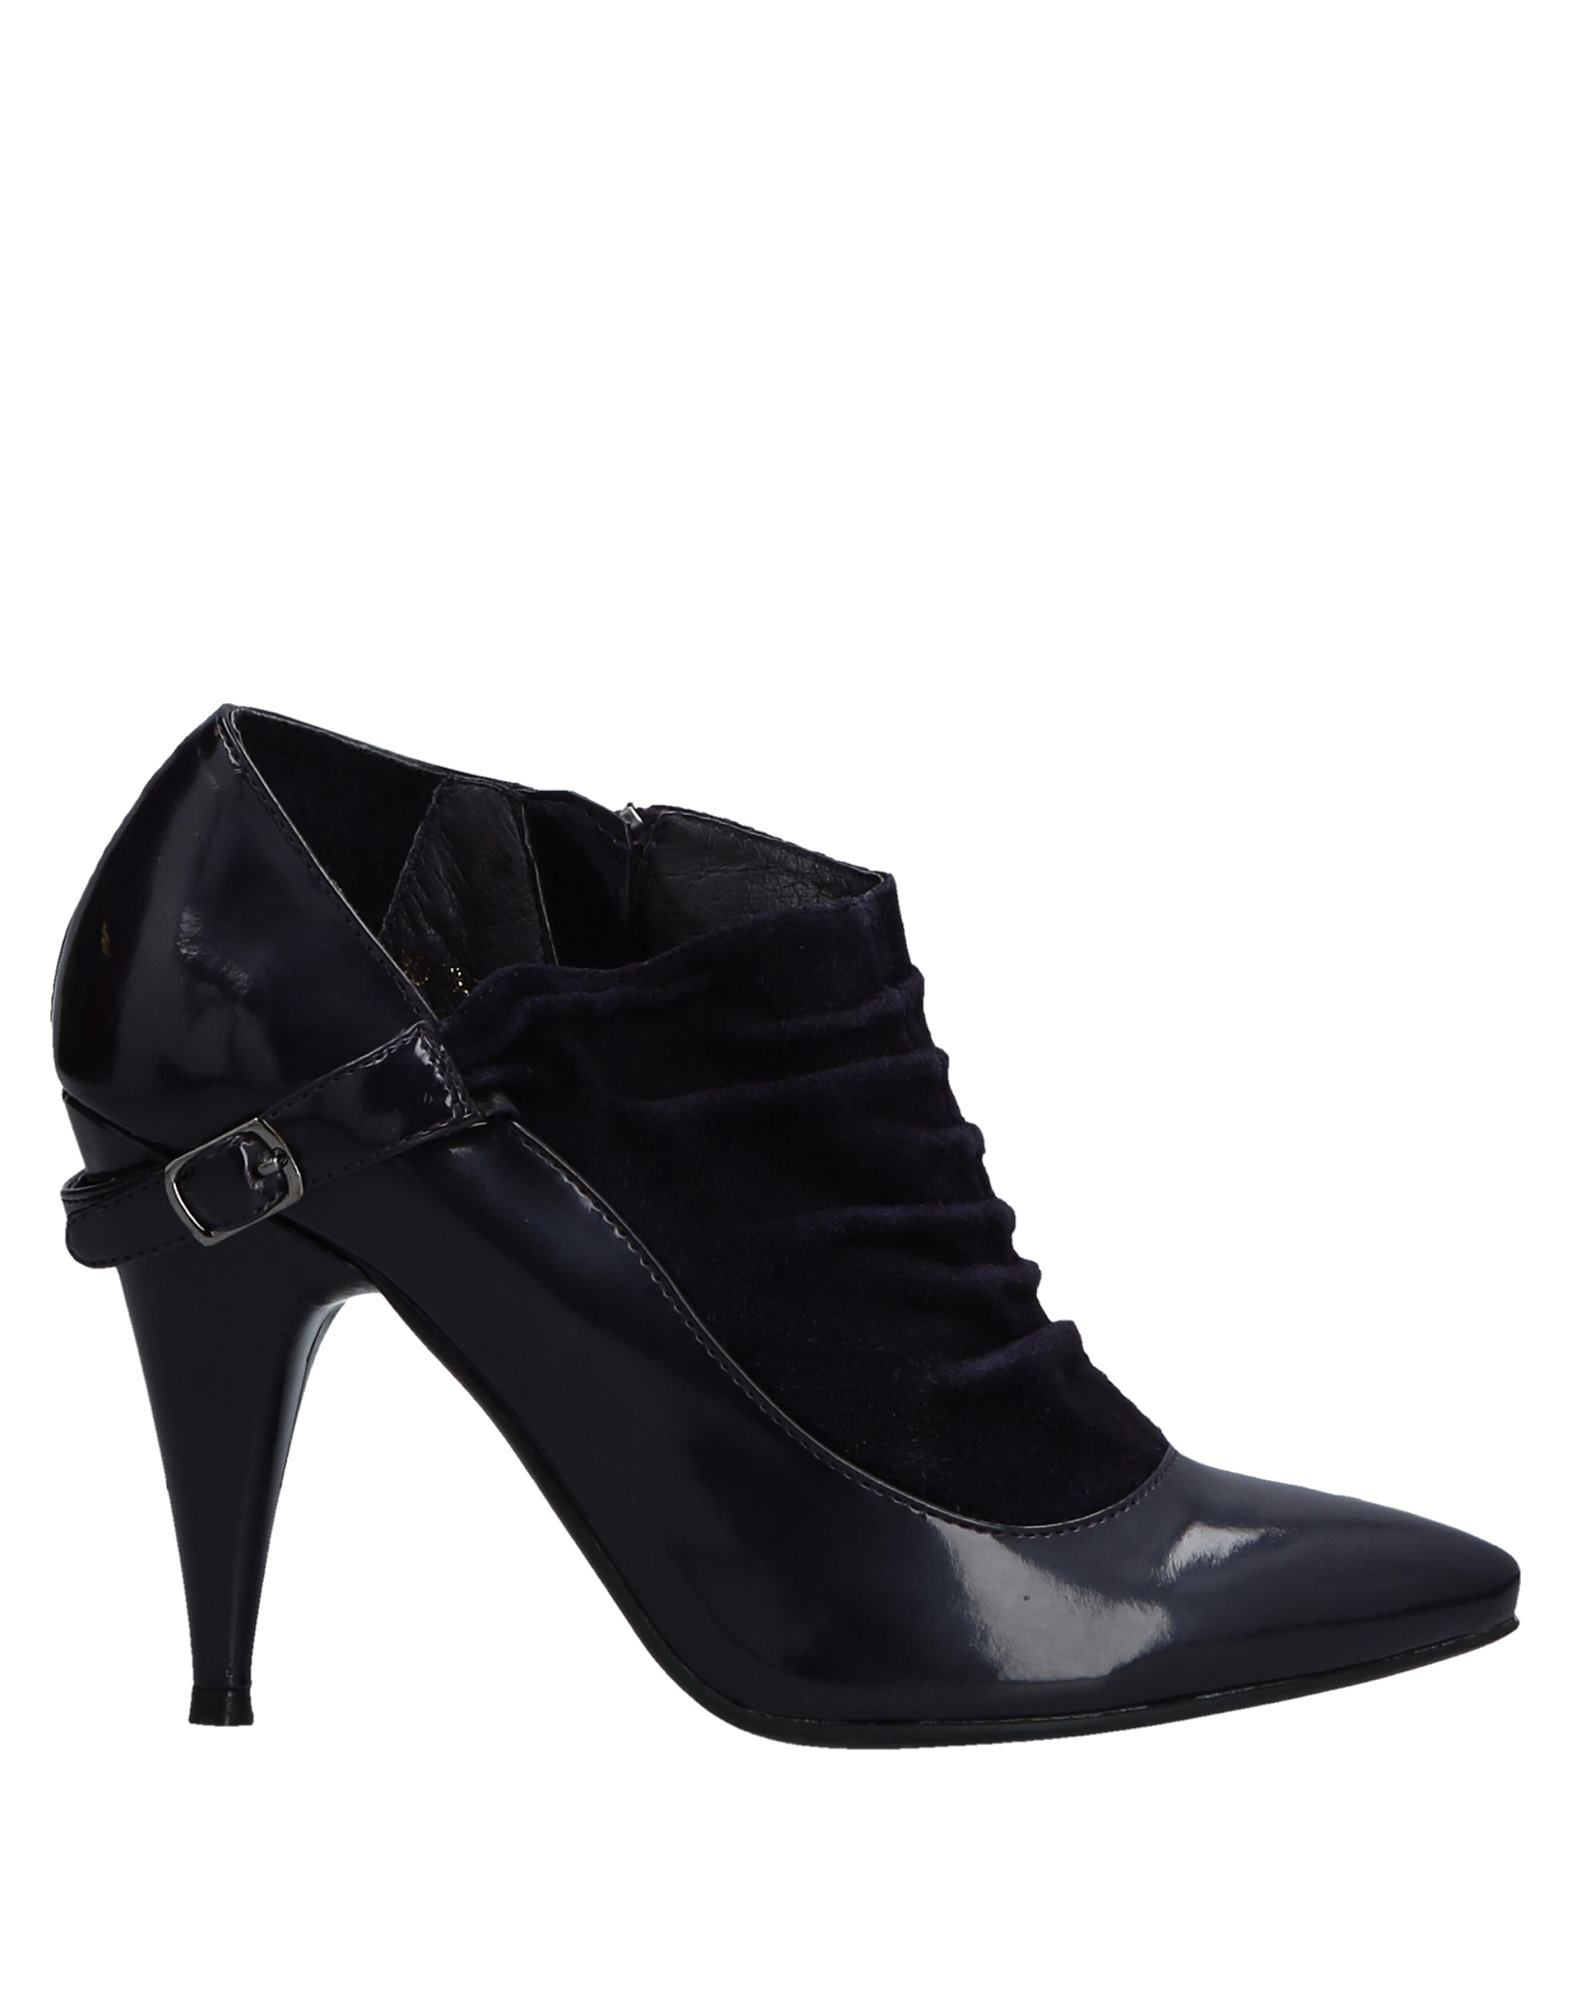 Pompili Gute Stiefelette Damen  11522835XV Gute Pompili Qualität beliebte Schuhe 505639